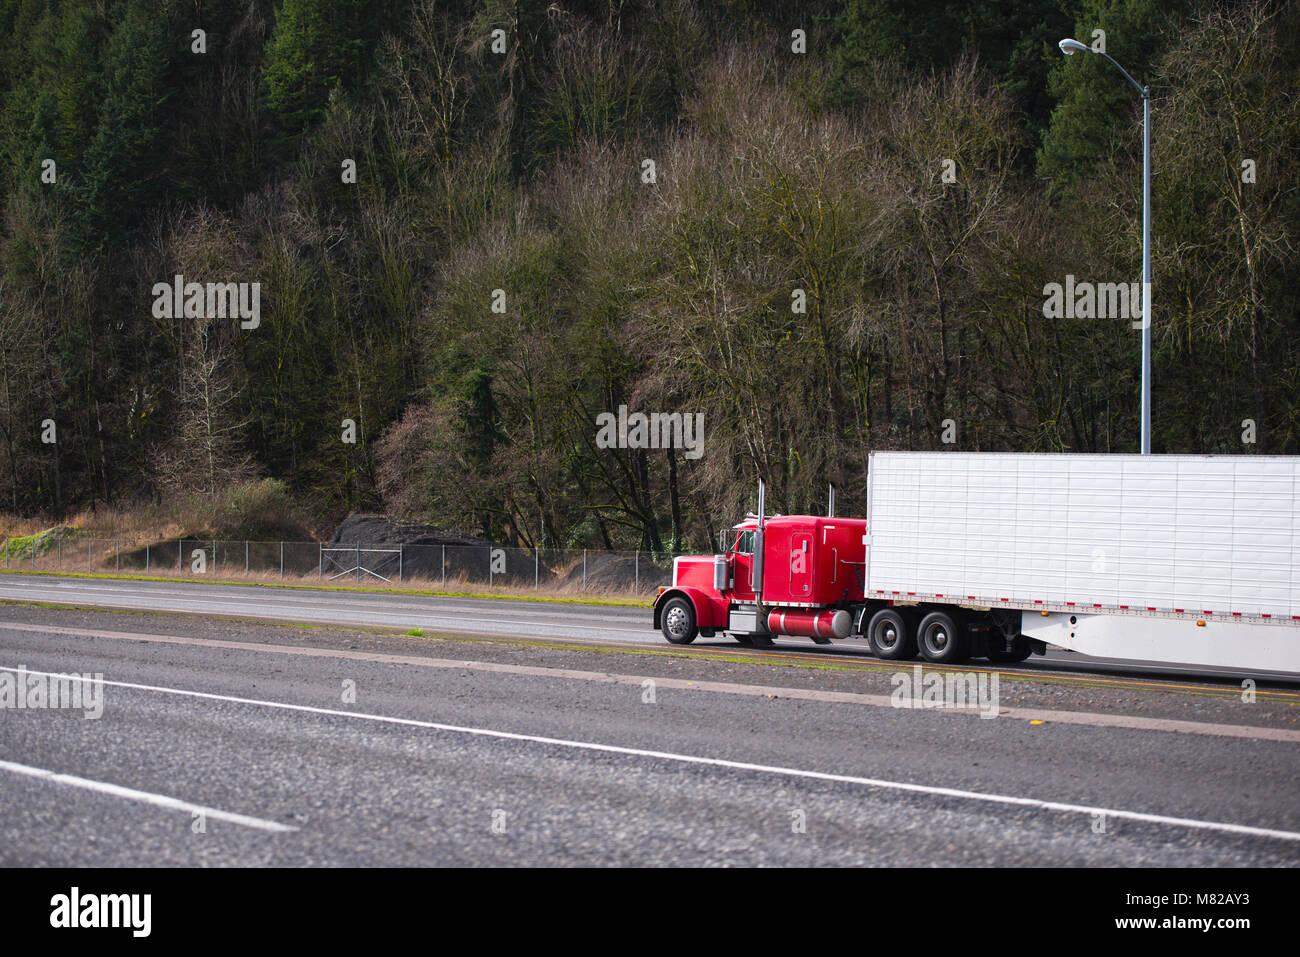 Amerikanischer Kühlschrank Flach : Big rig klassische amerikanische motorhaube kraftvolle rot semi